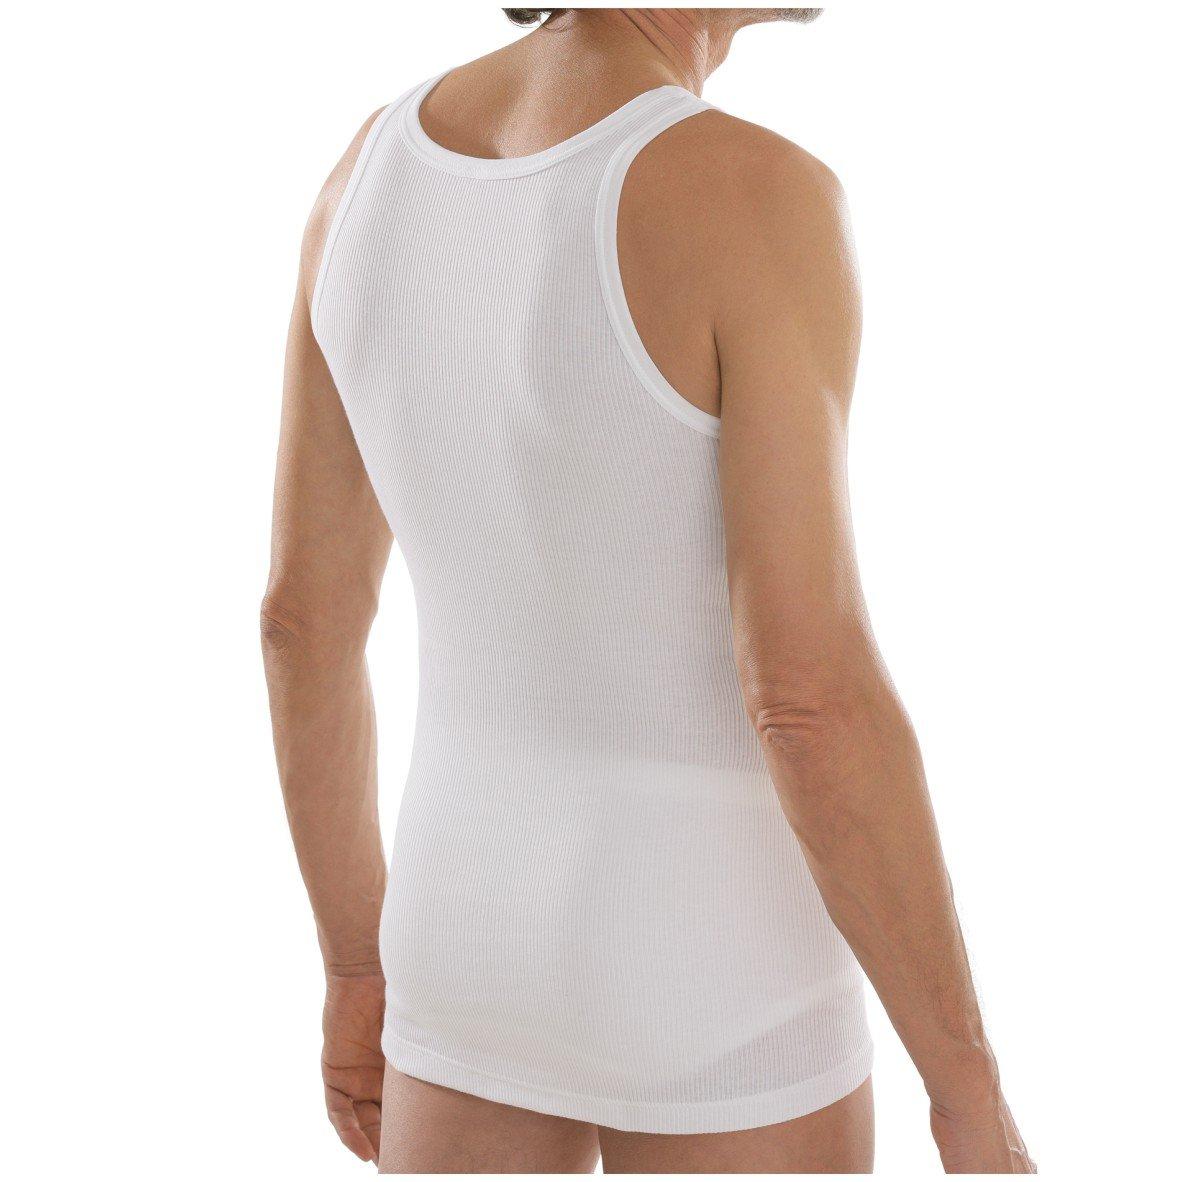 comazo Herren platin Hemd ohne Arm Doppelripp  Amazon.de  Bekleidung 4ec81ea3f7